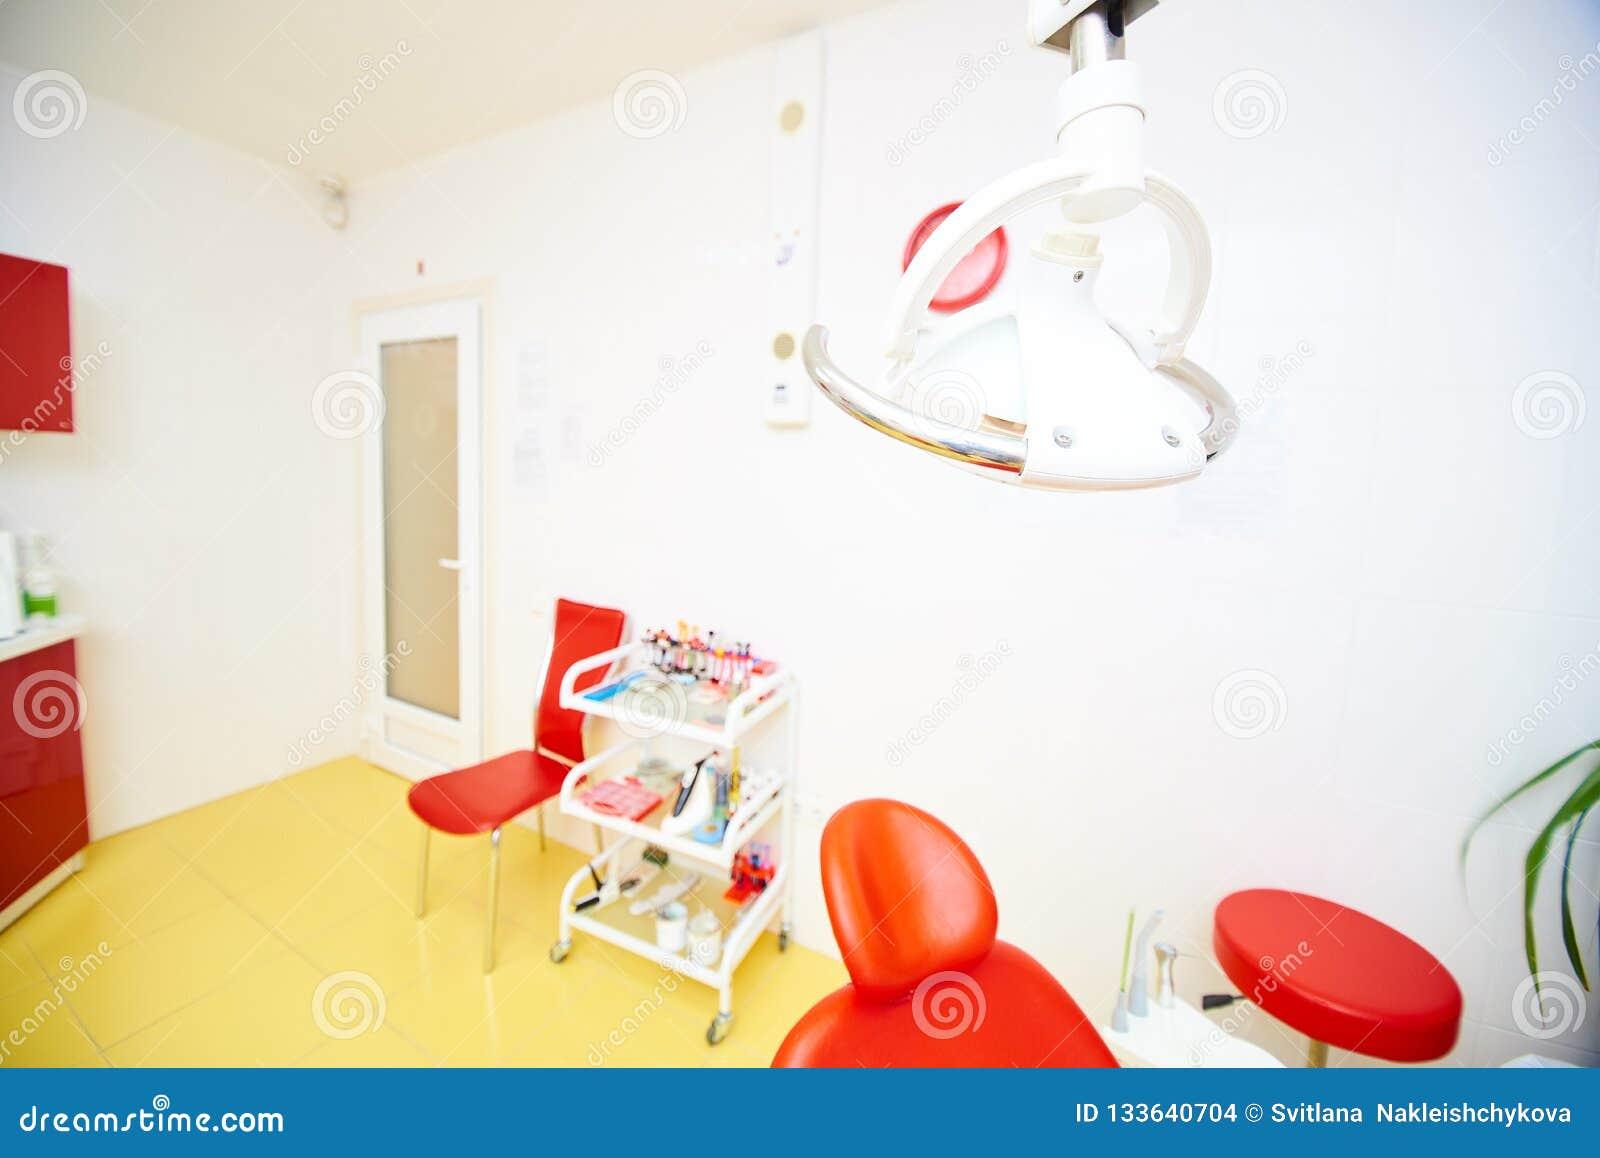 Art dentaire, traitement dentaire